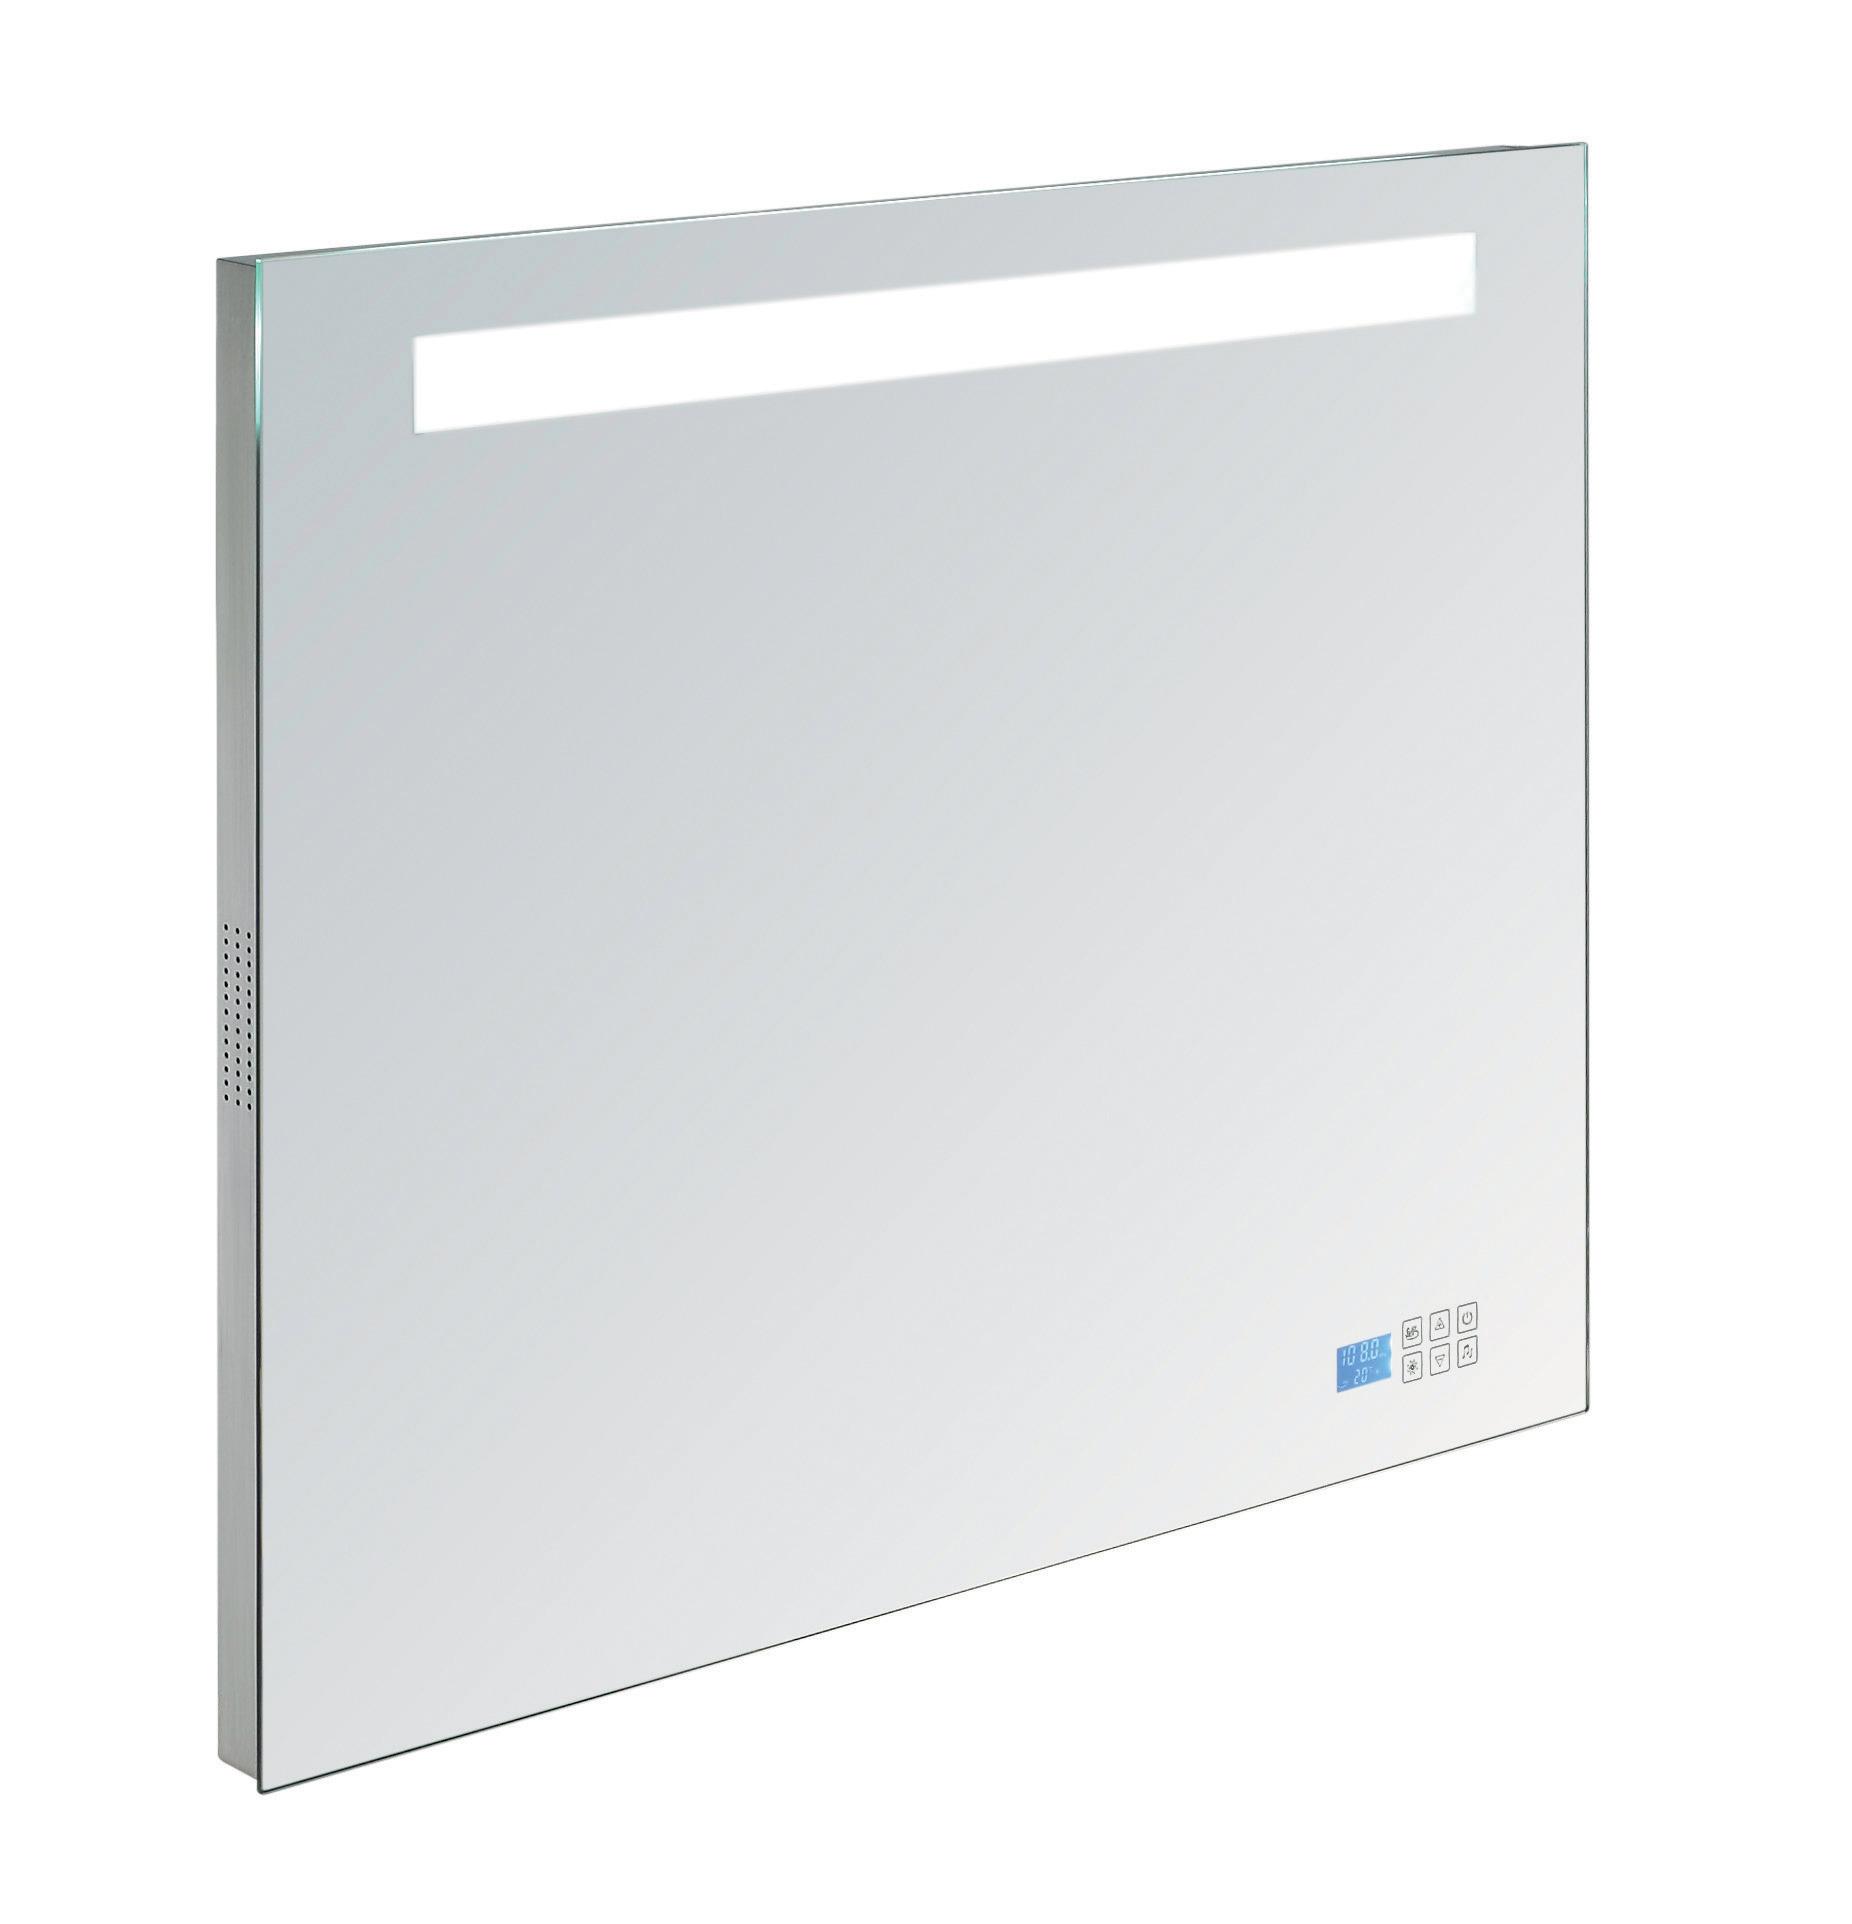 Interessant Badkamer spiegel B.80 x H.70 x D.4,5 cm TL verlichting, inclusief  TI29